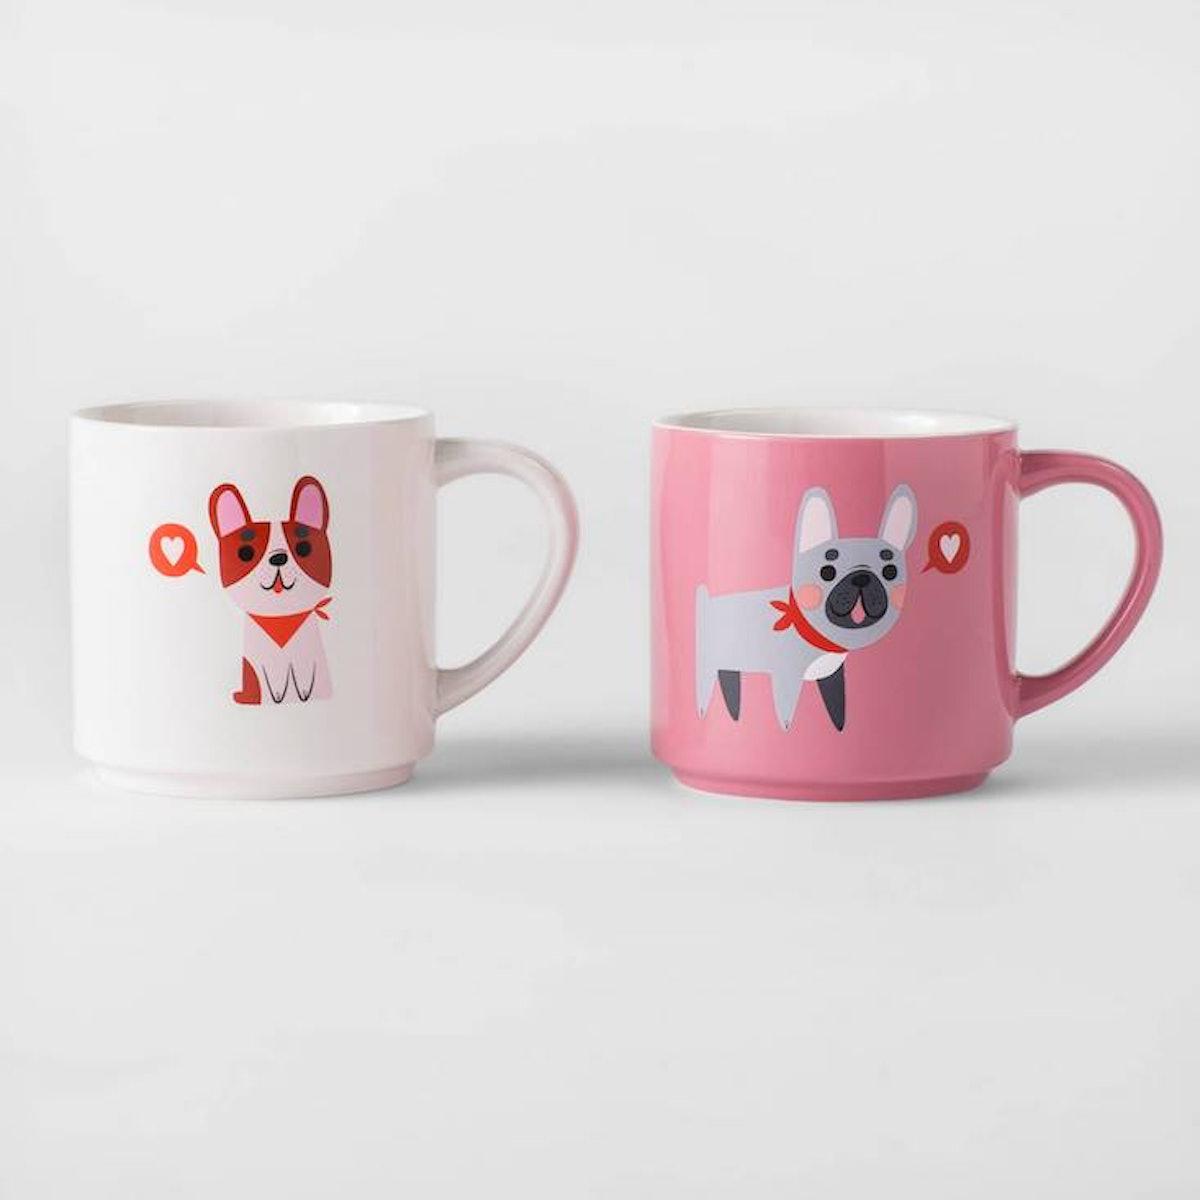 Threshold Valentine Dogs Glazed Stoneware Mug, Set of 2